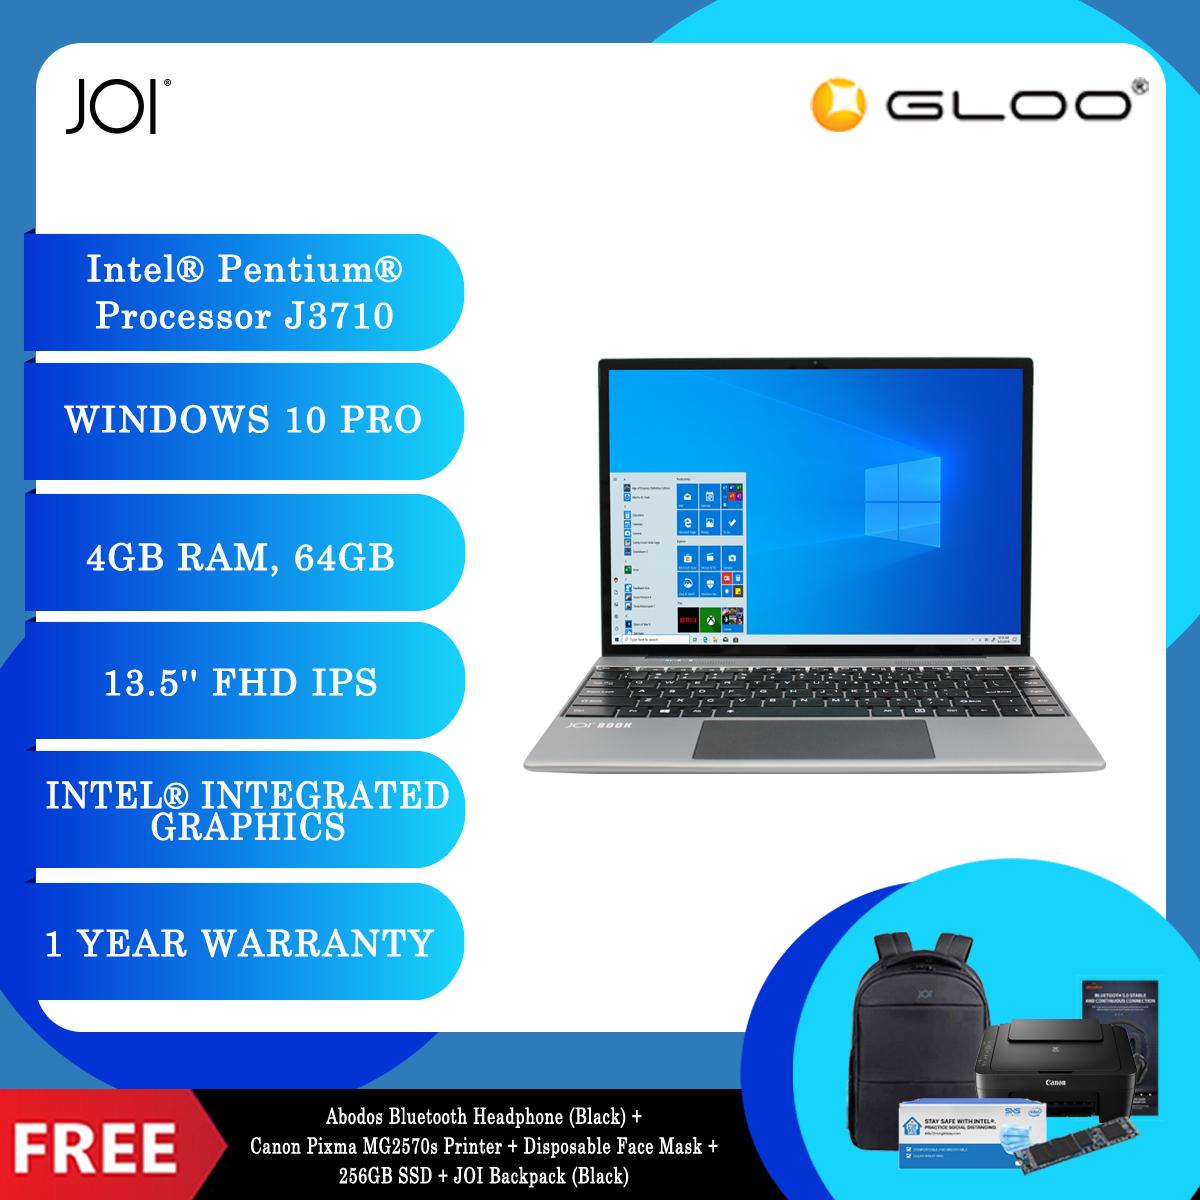 JOI Book 200 Pro + Abodos Bluetooth Headphone Black + Canon Pixma MG2570s Printer + Disposable 3 Layer Face Mask + 256GB SSD + JOI Backpack (Black) [BPPJOI0200PRBK]